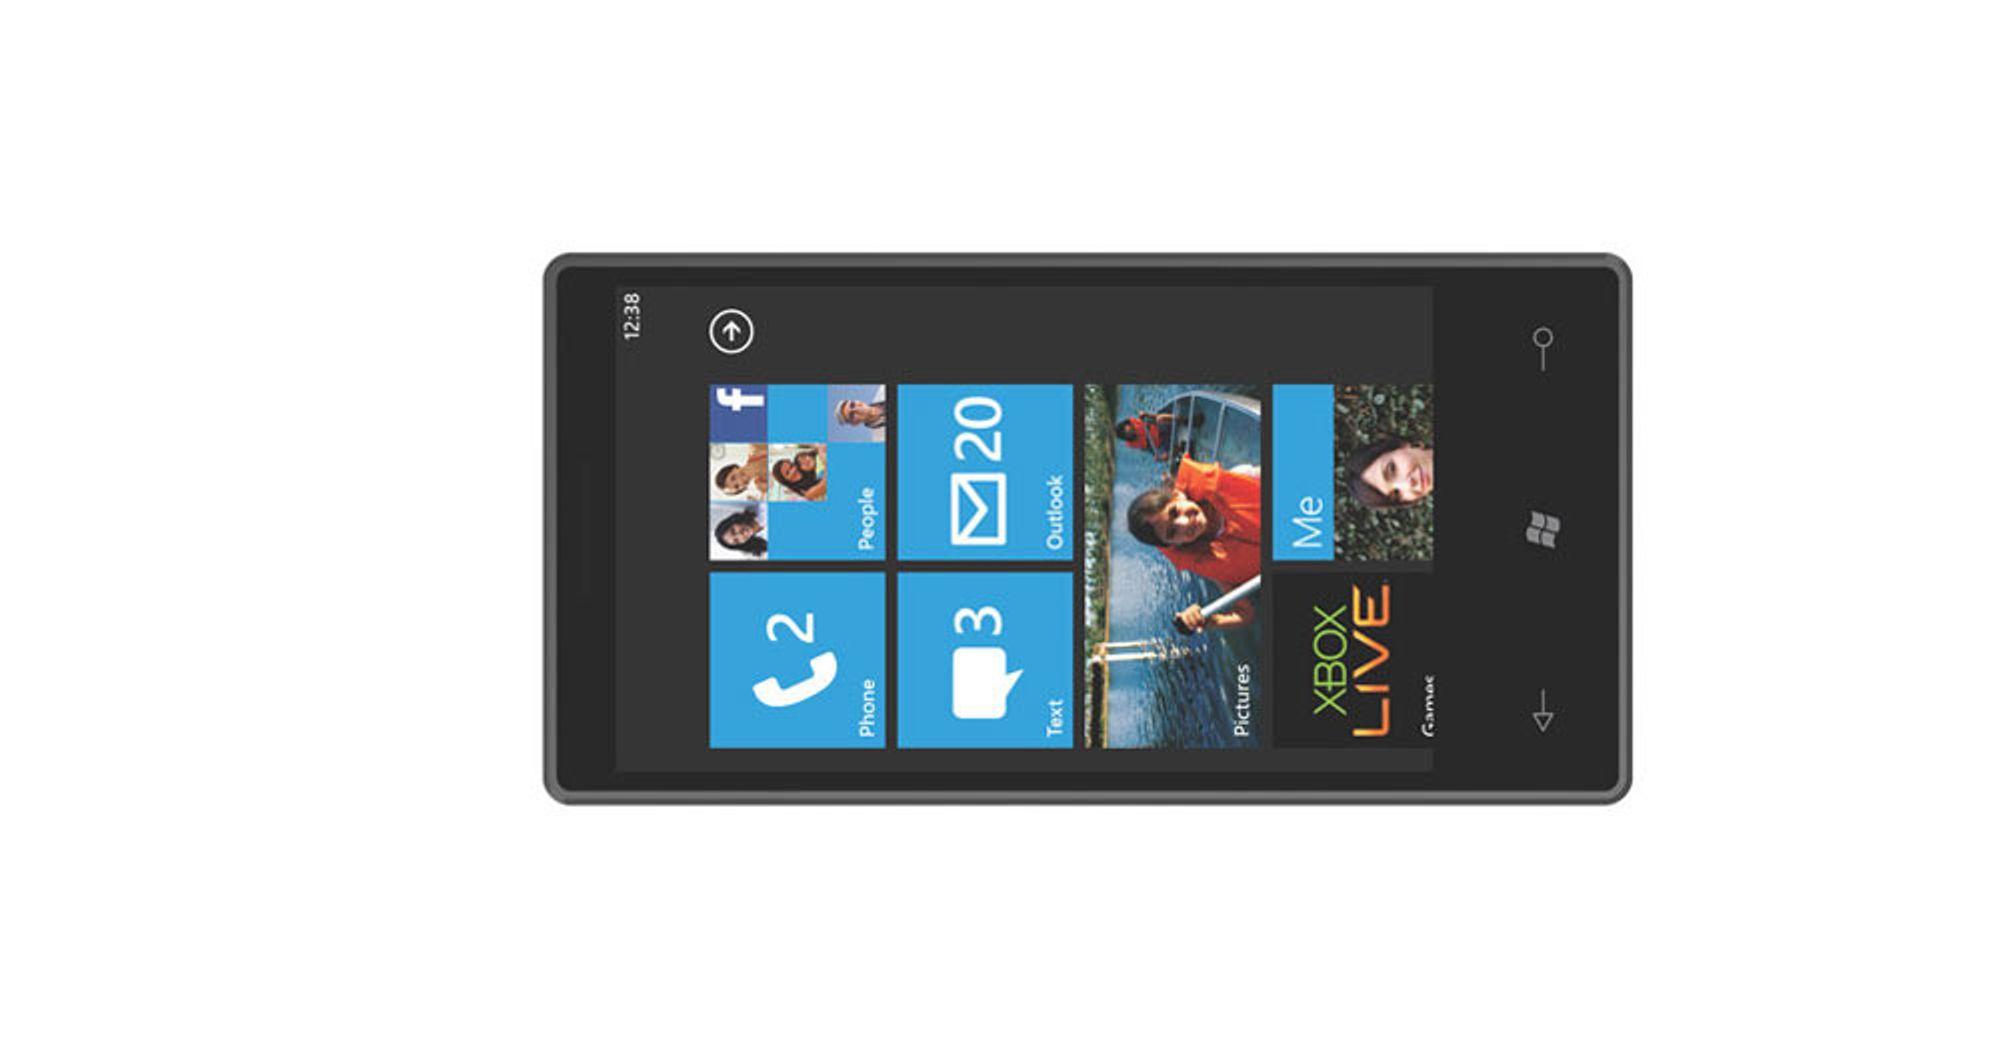 Under skallet på Windows Phone 7